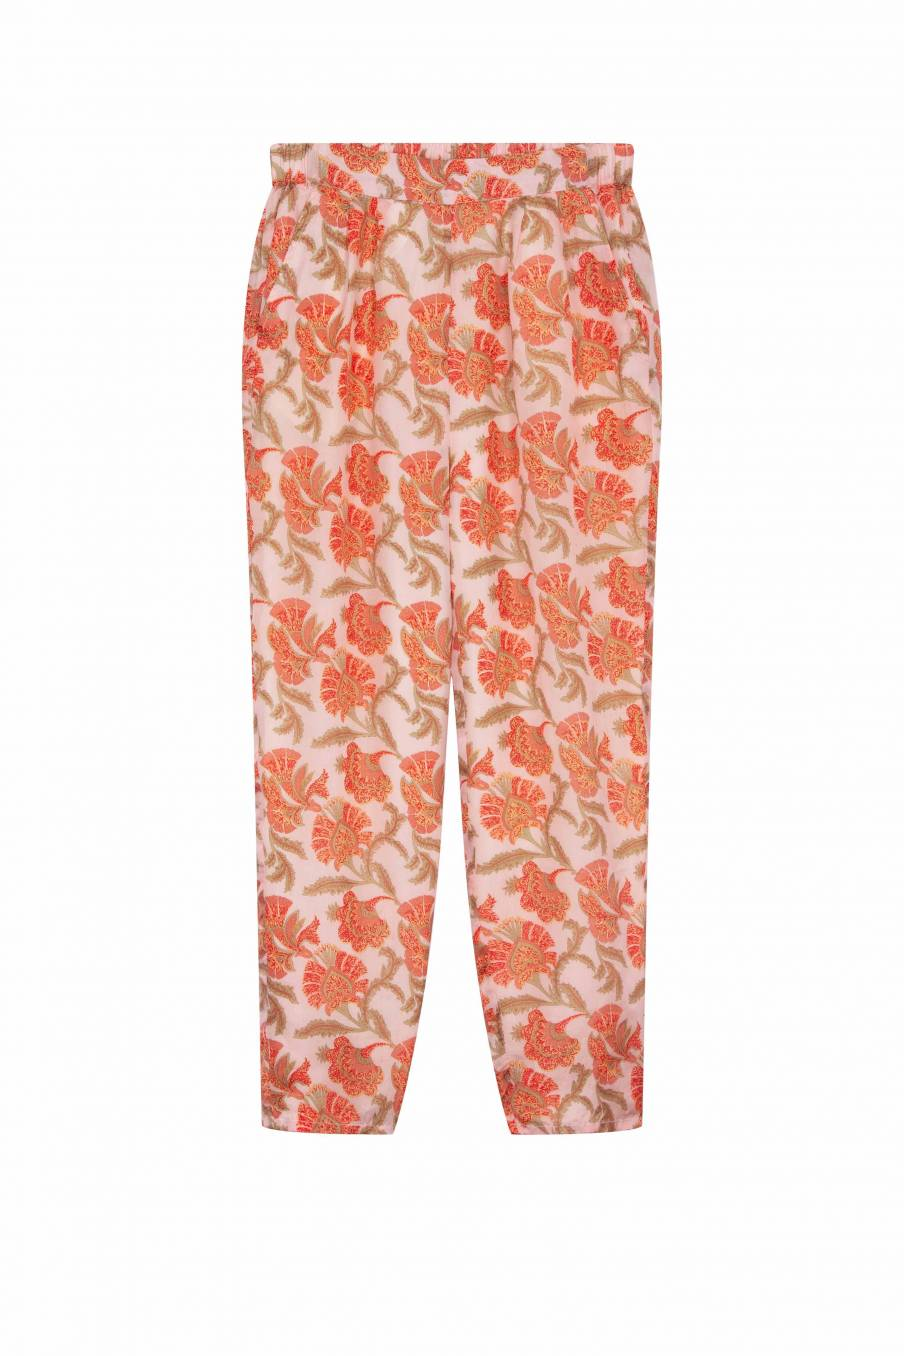 Pants Chama Bohemian Flowers